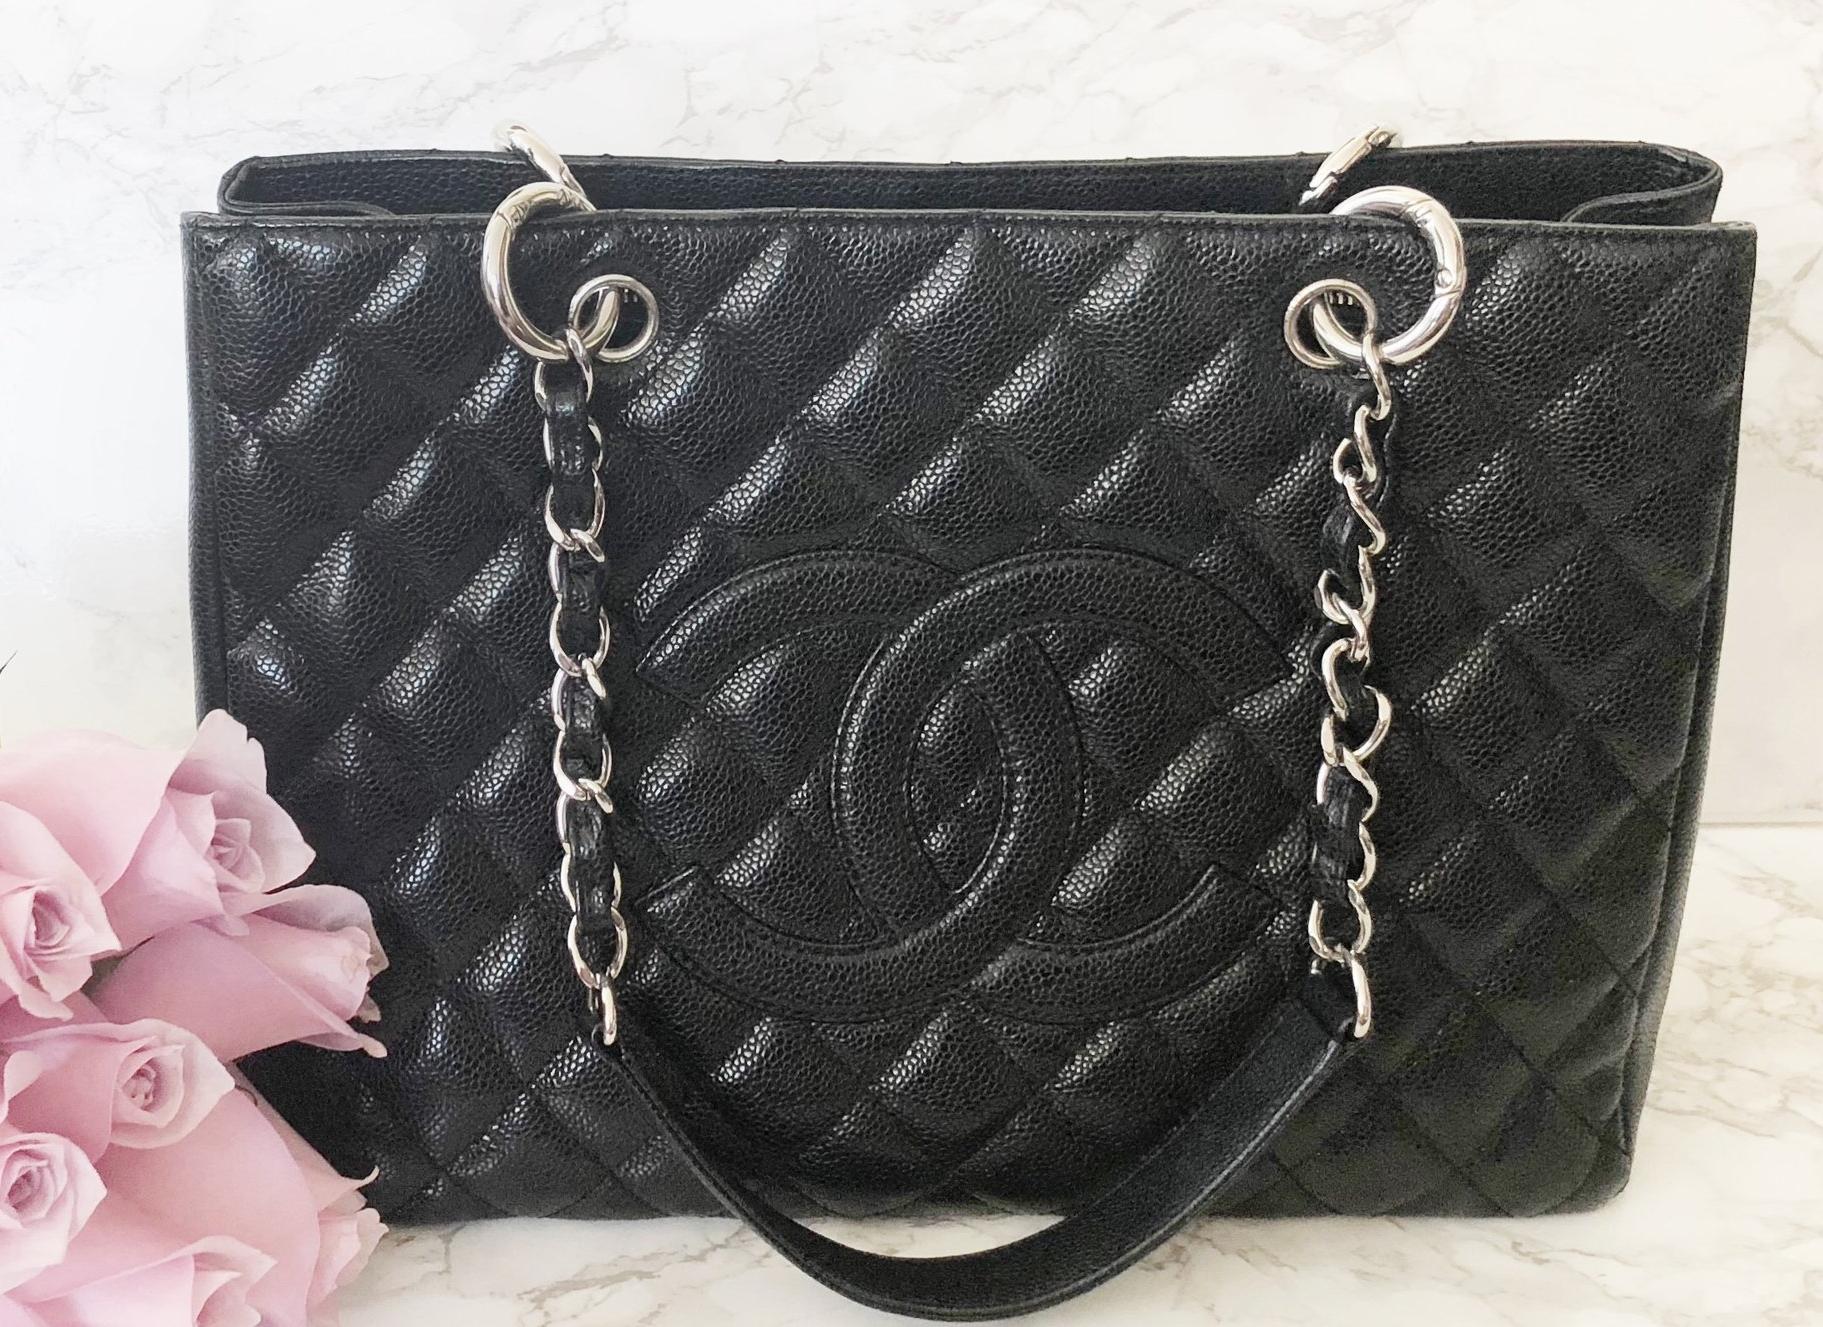 My 2009 Chanel GST